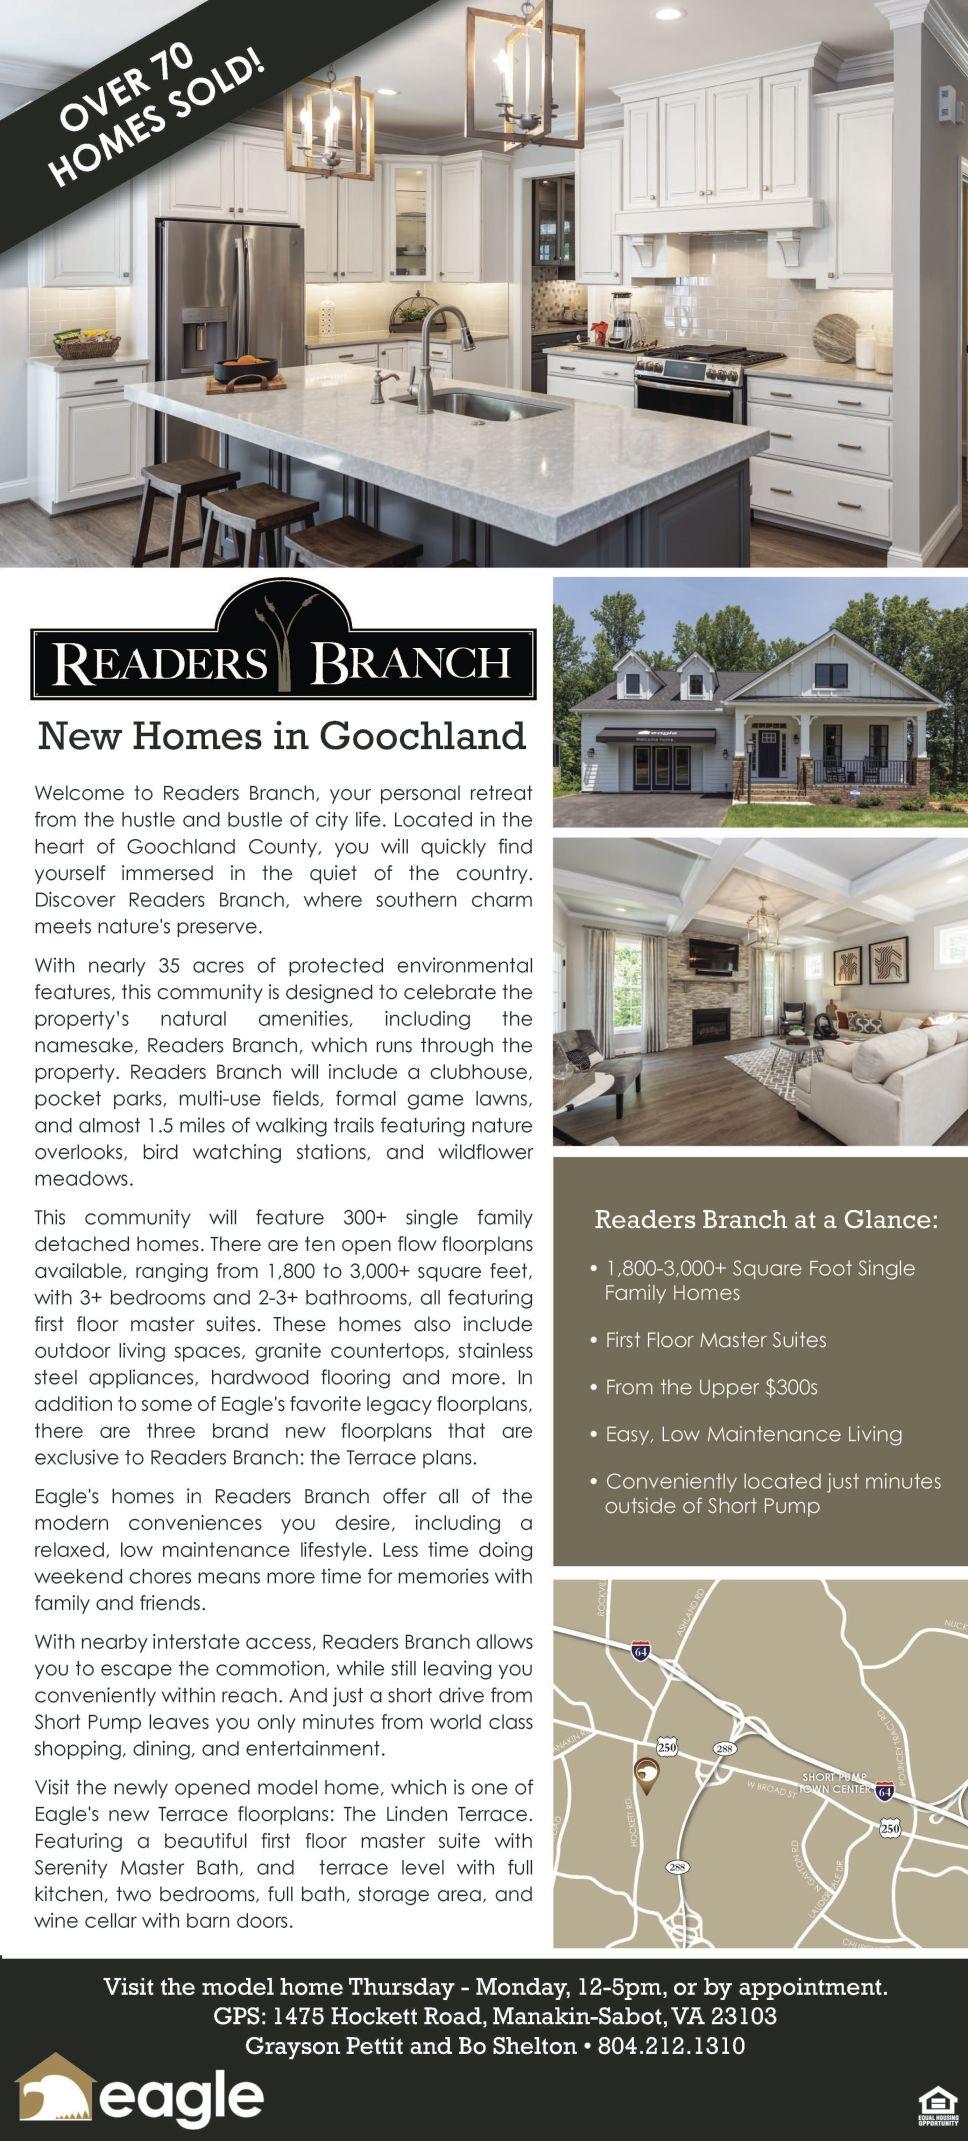 Readers Branch: New Homes in Goochland 01